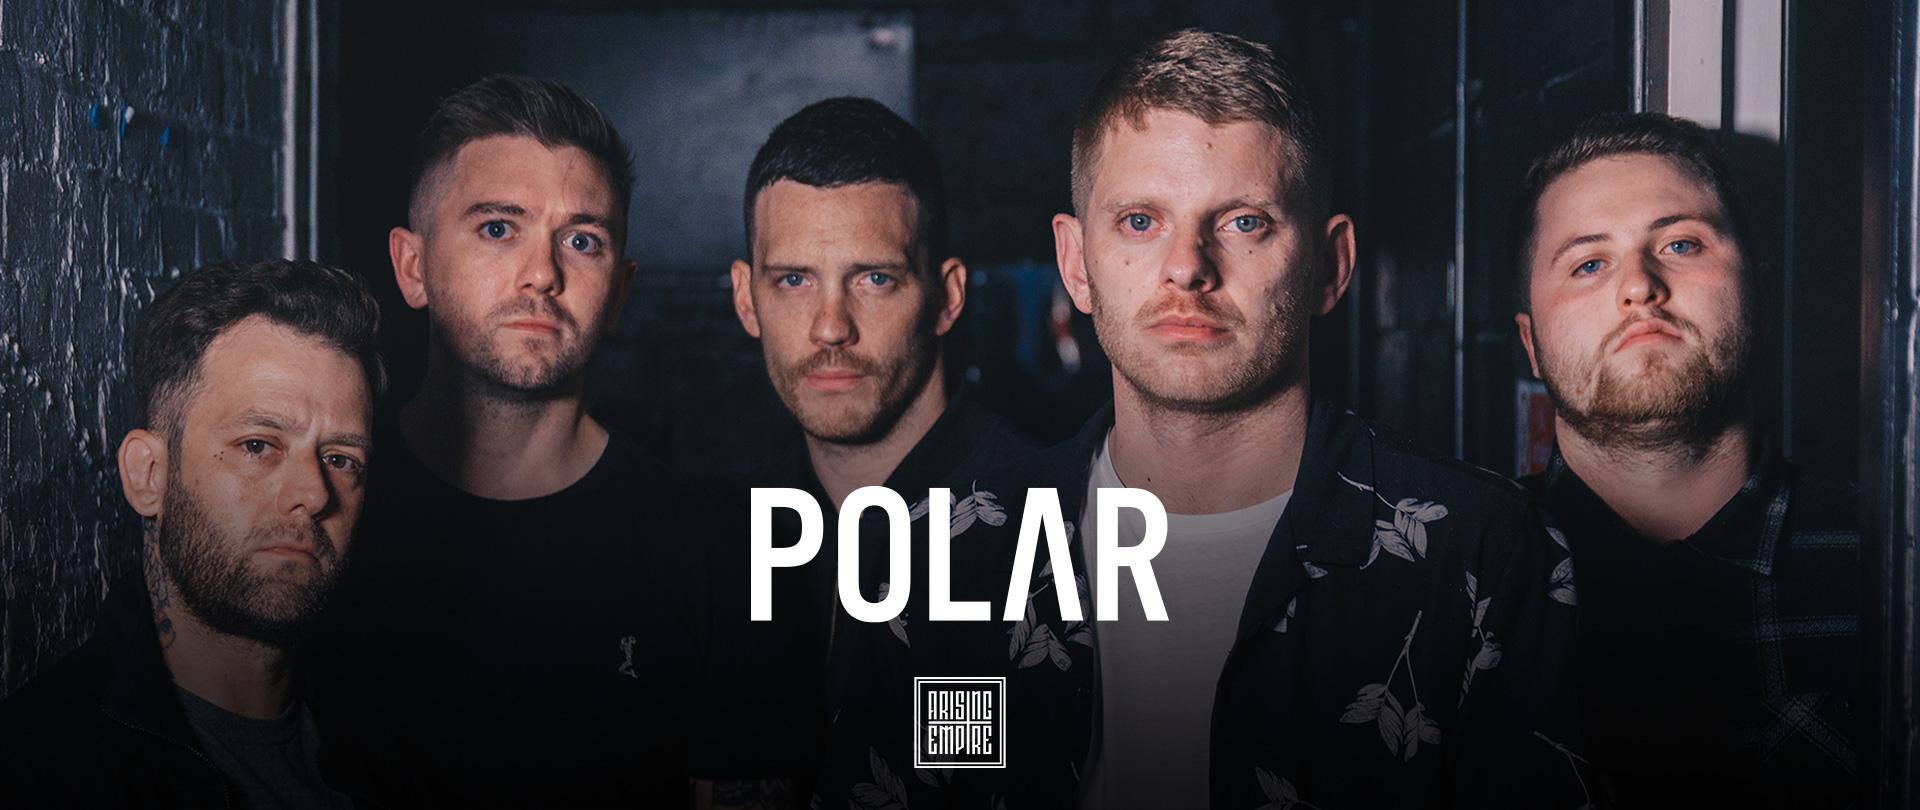 Polar at Arising Empire • Offizieller Online Shop